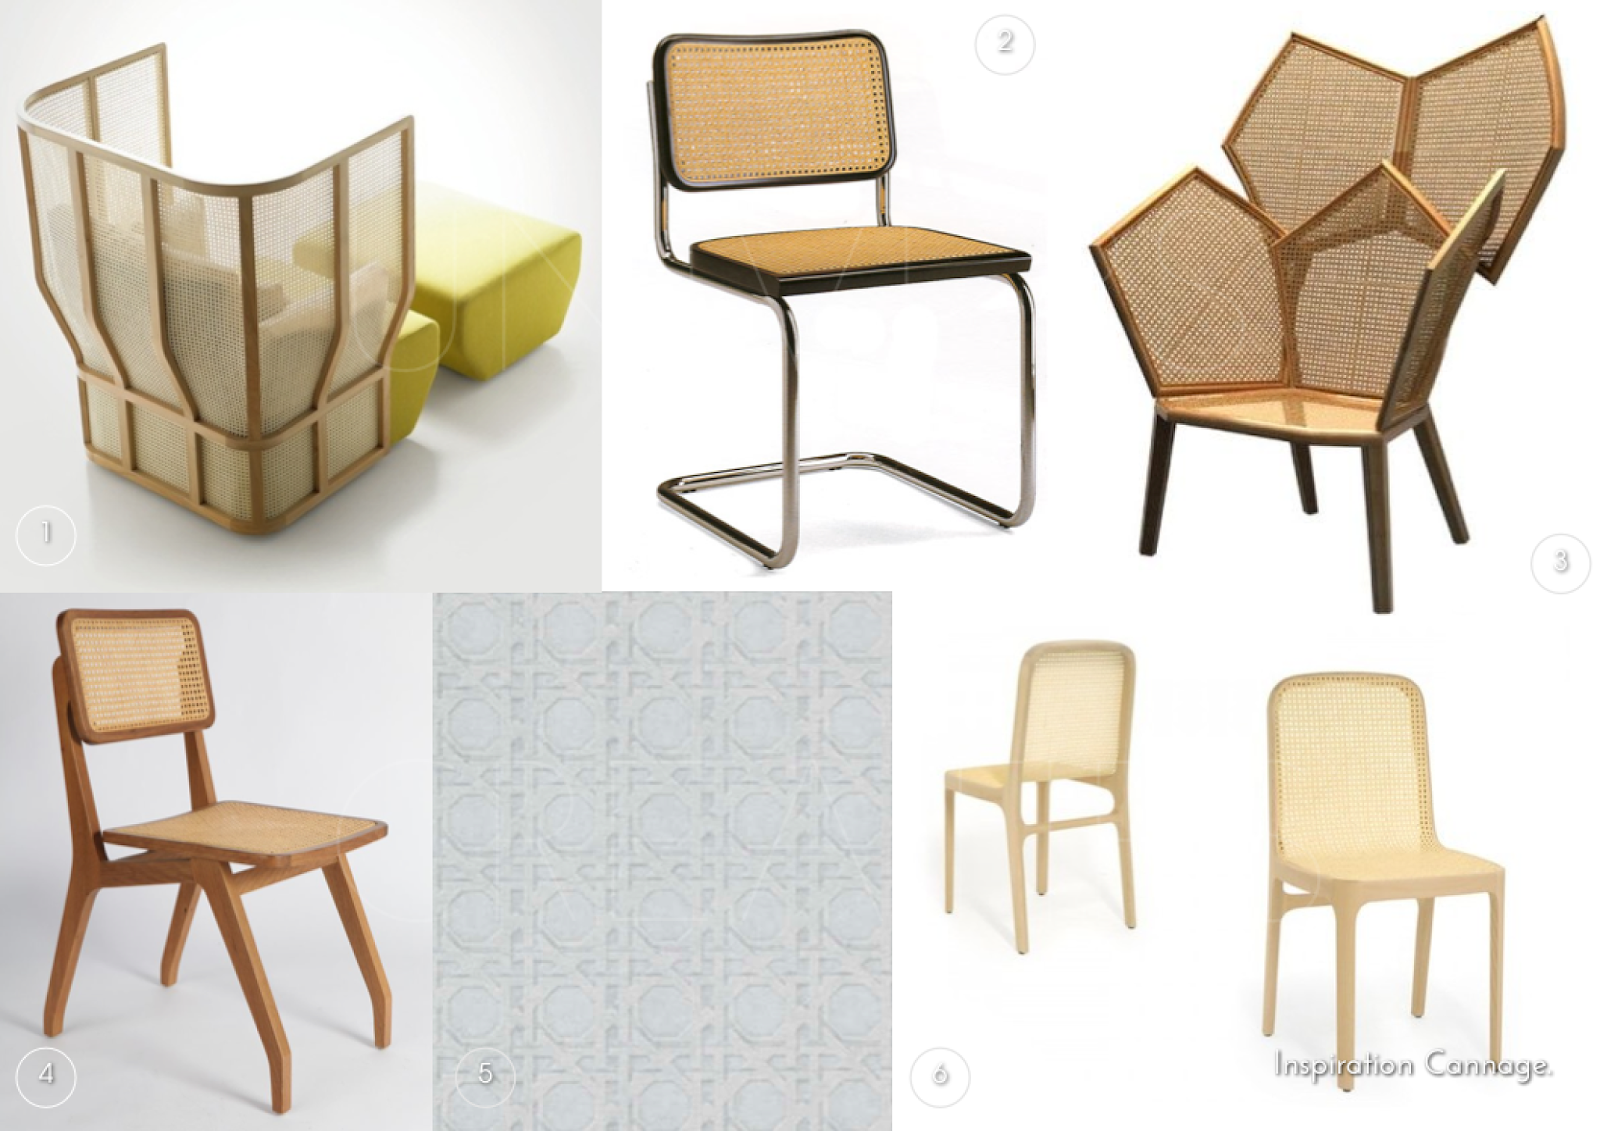 univers creatifs inspiration cannage. Black Bedroom Furniture Sets. Home Design Ideas